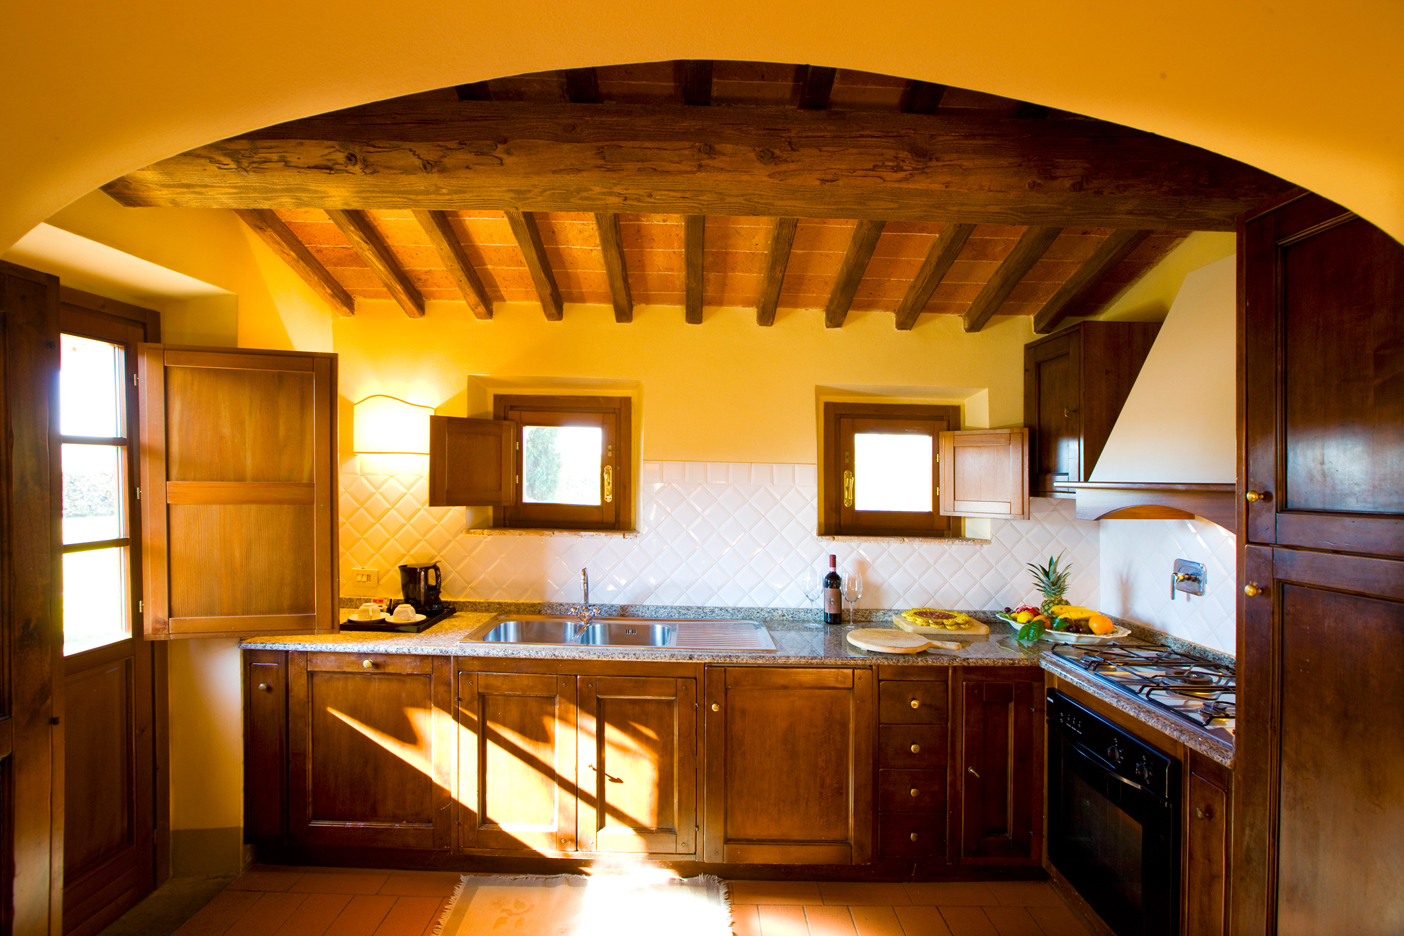 Monsignor della casa villa tinaia en villa frantoio for 20 x 20 planimetrie della casa